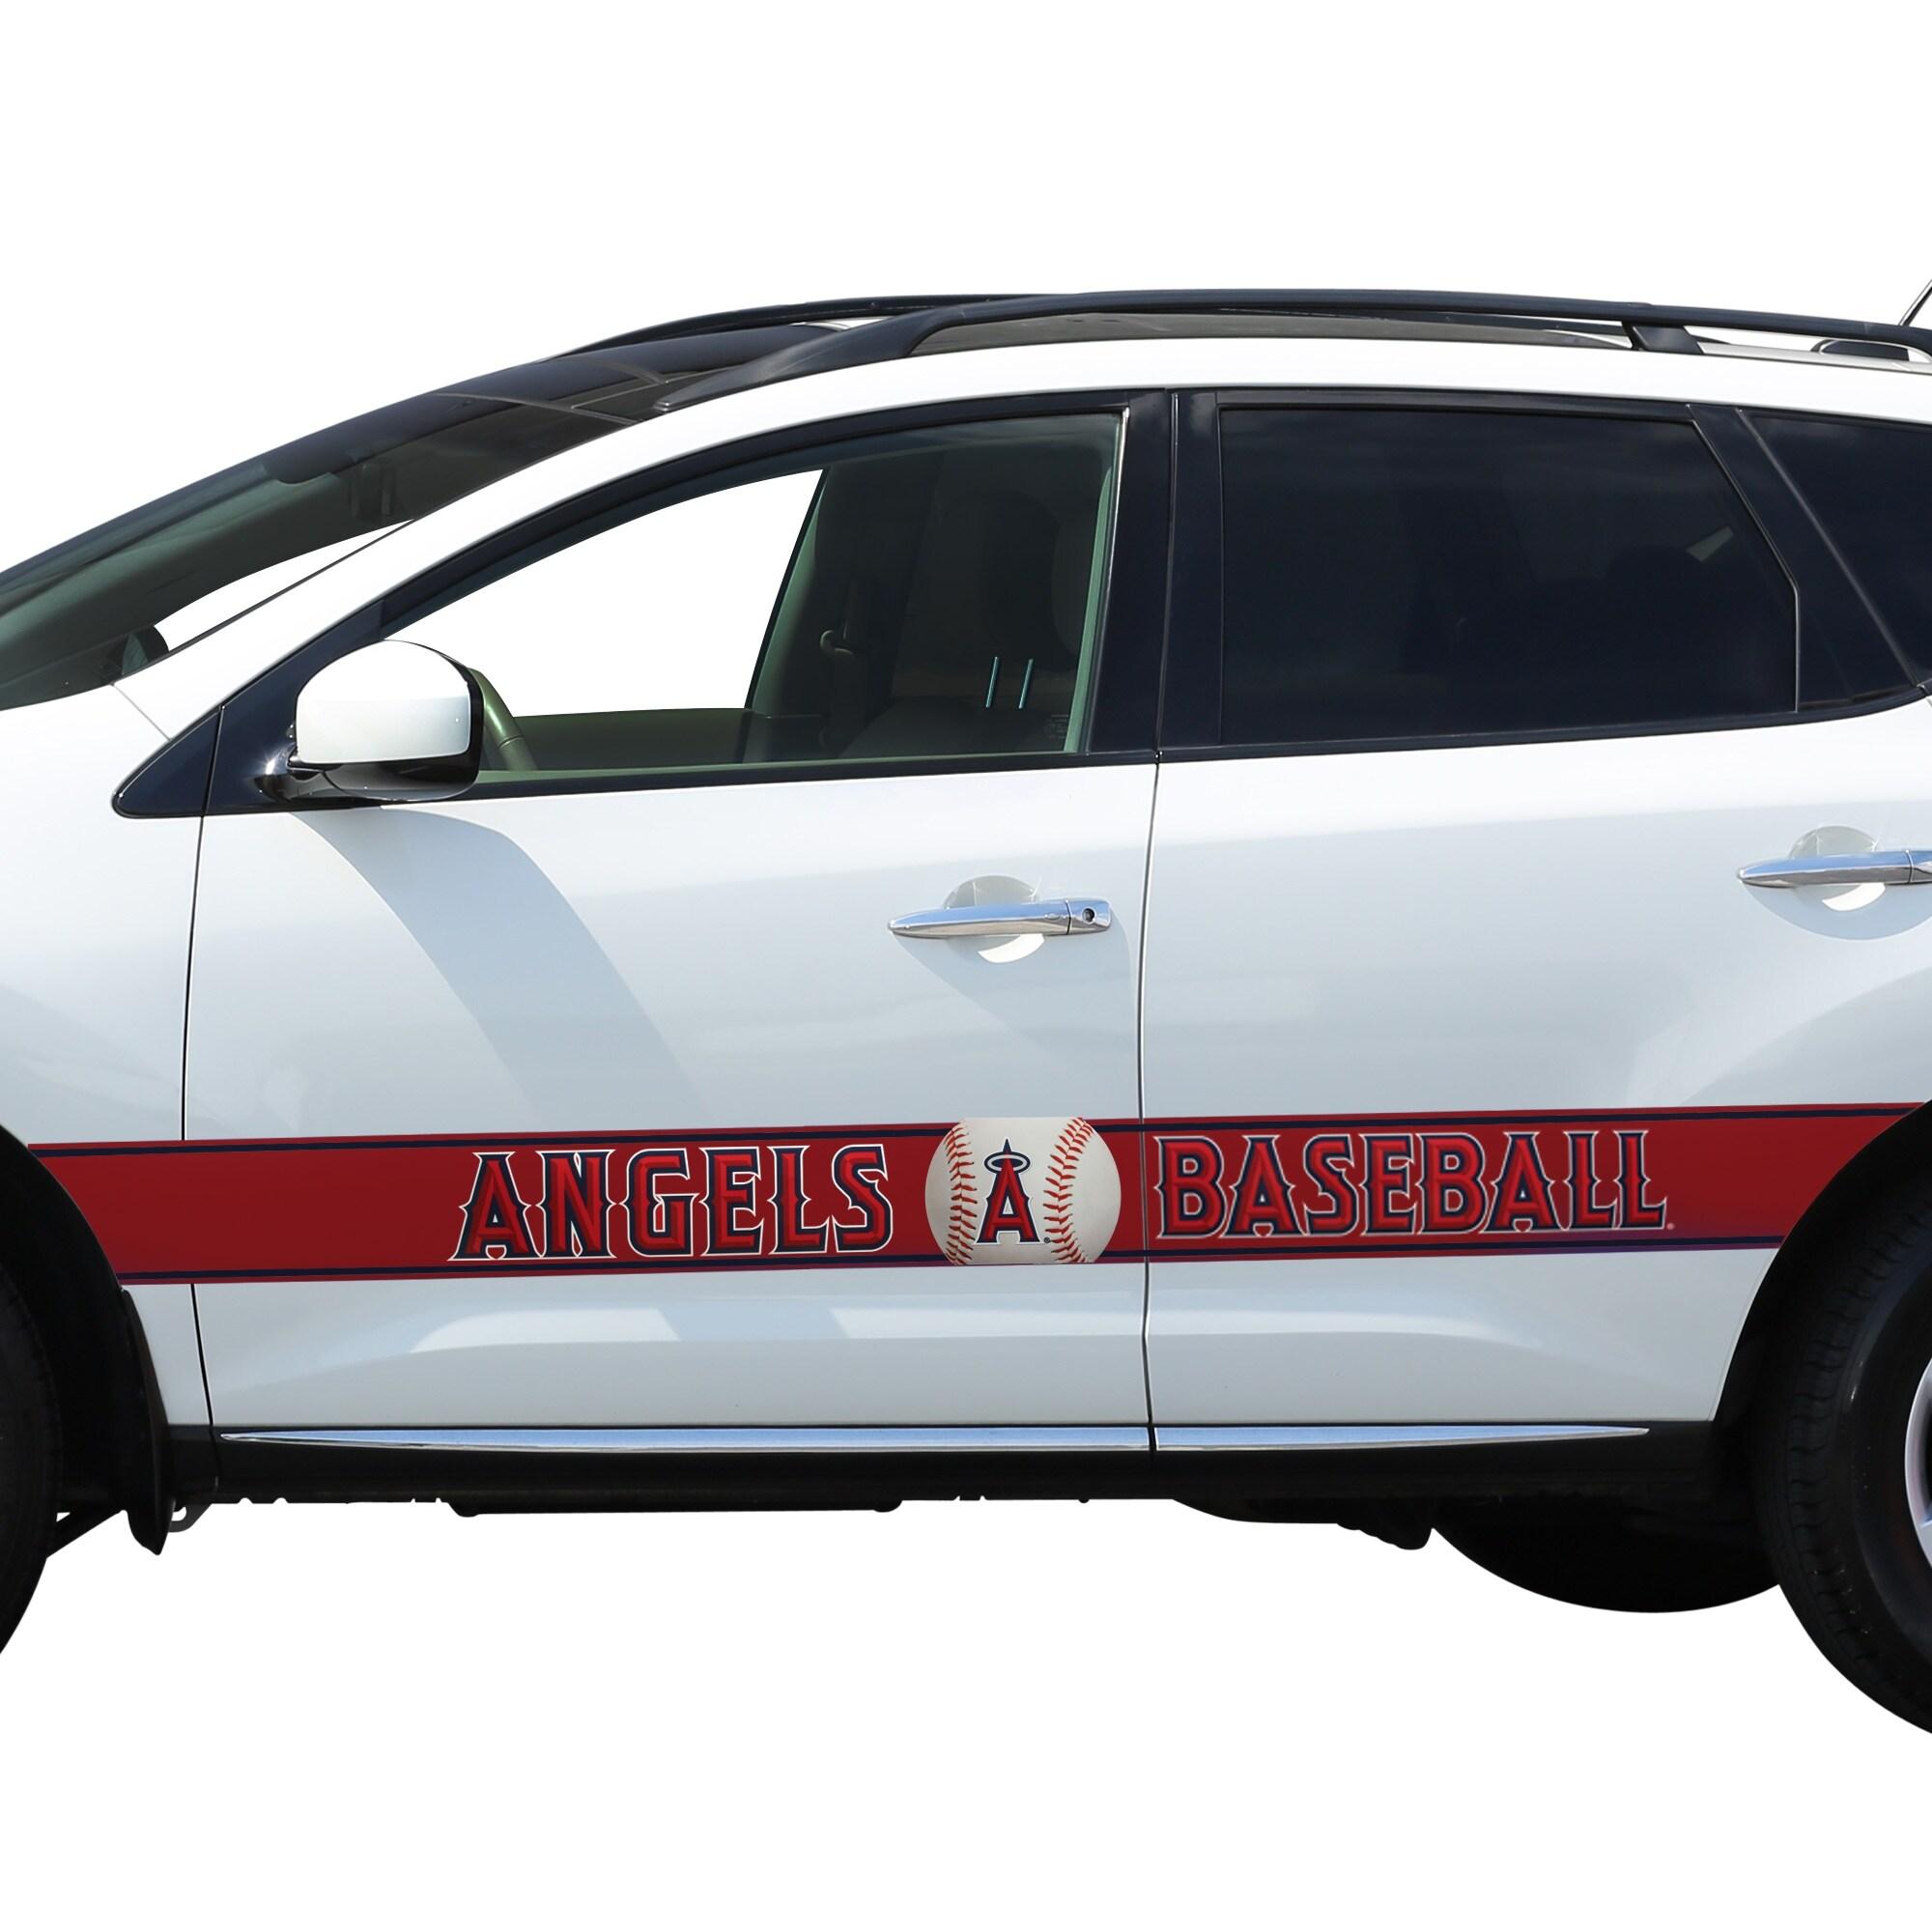 Los Angeles Angels Team Ball Racing Stripe Car Decals